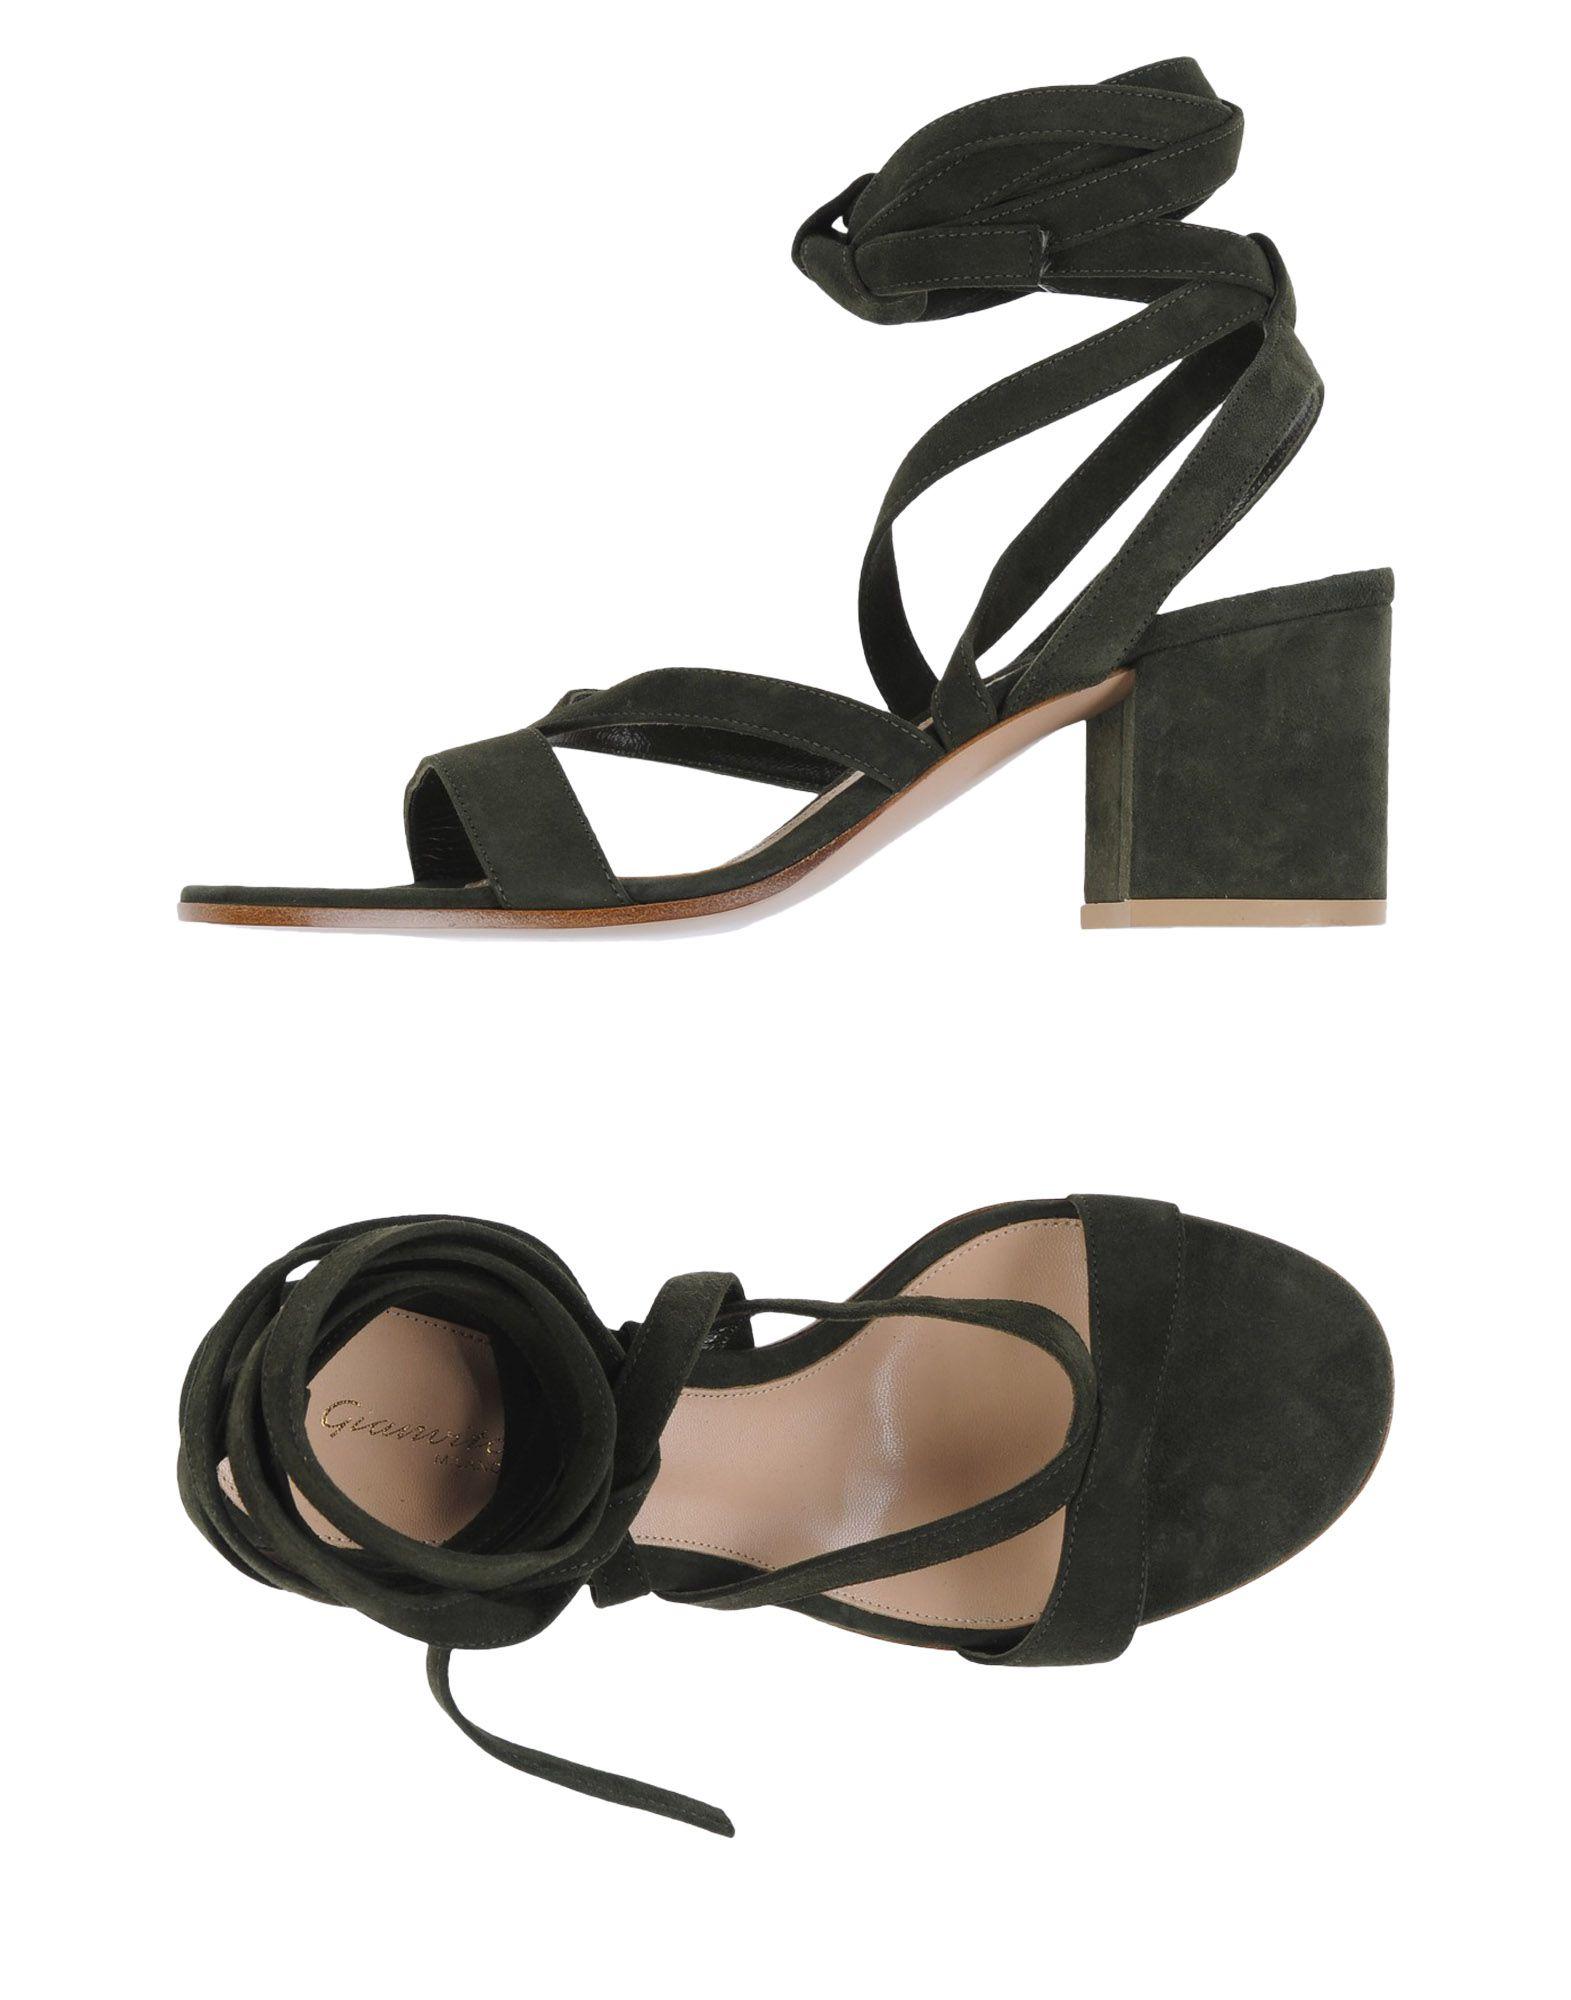 Rabatt Schuhe Gianvito Rossi Sandalen 11143148WN Damen  11143148WN Sandalen 384b66